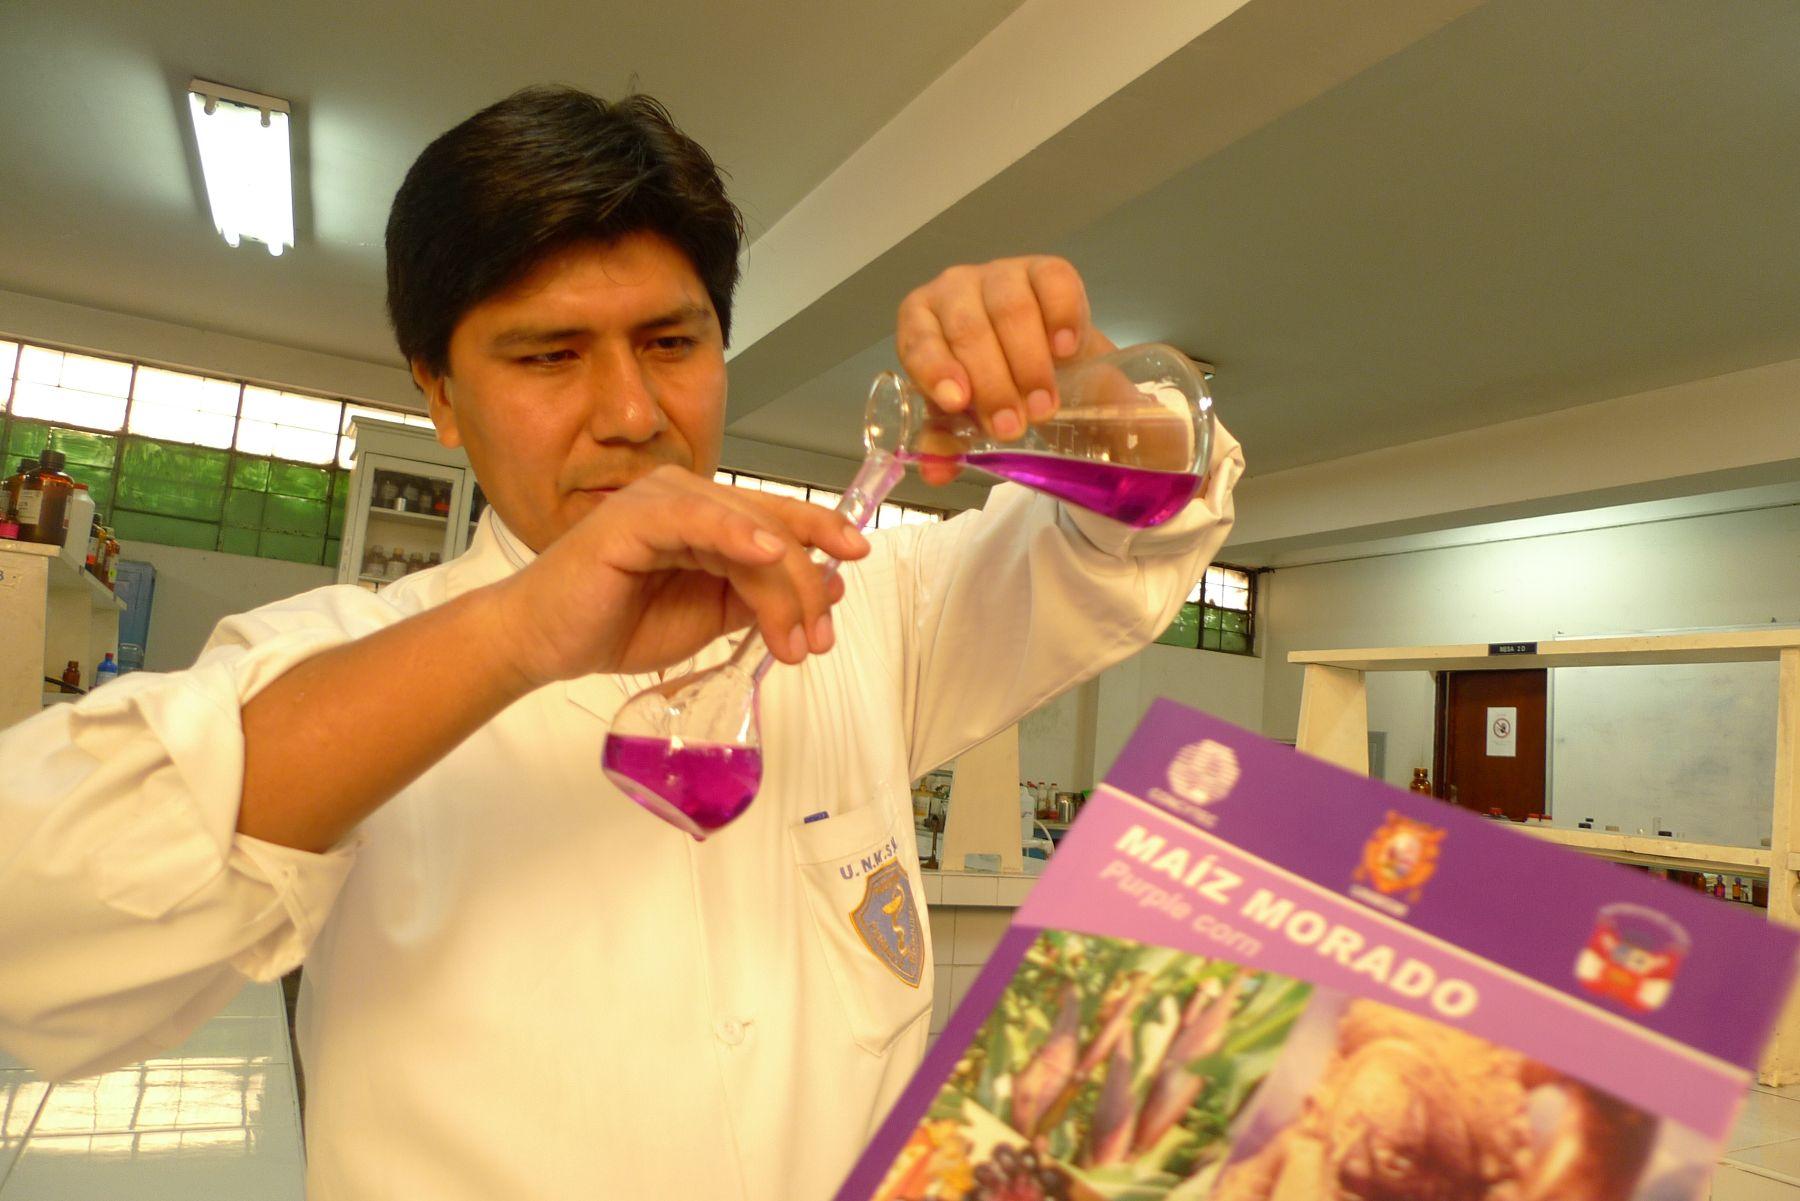 Doctor Mario Carhuapoma analiza propiedades antioxidantes del pigmento del maíz morado. Foto: ANDINA/Josimar Cóndor.